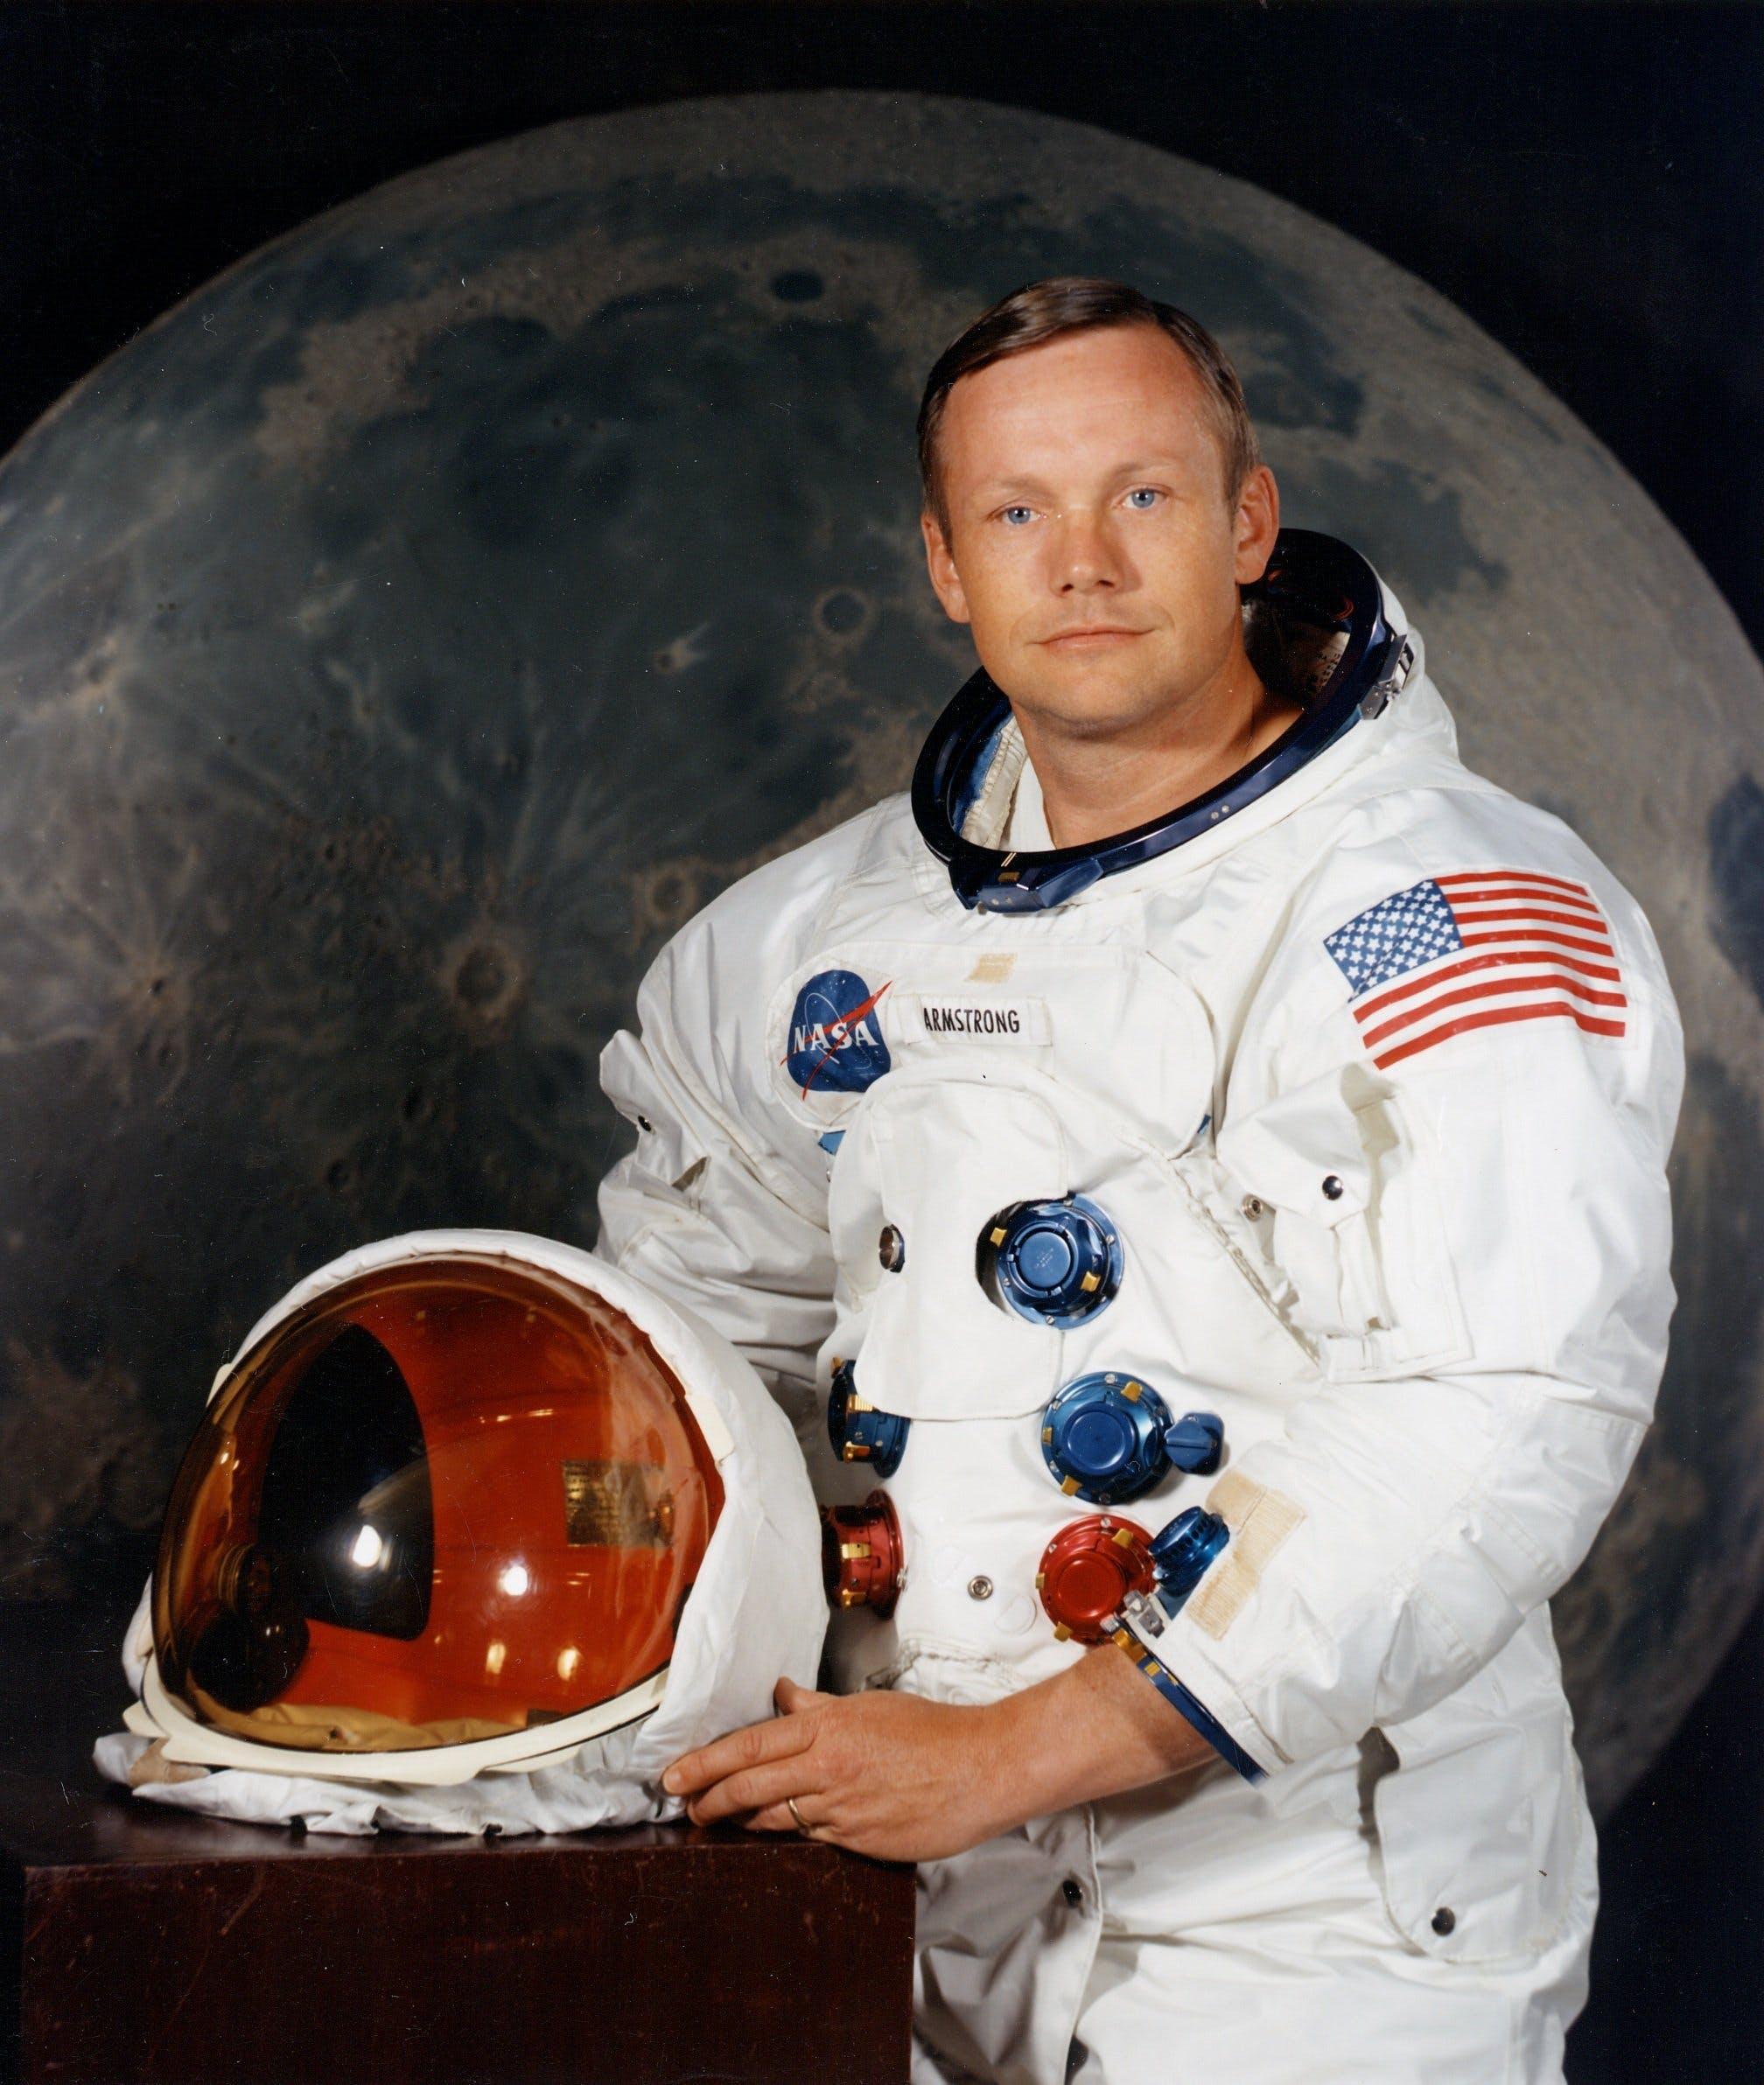 Man Wearing Astronaut Suit